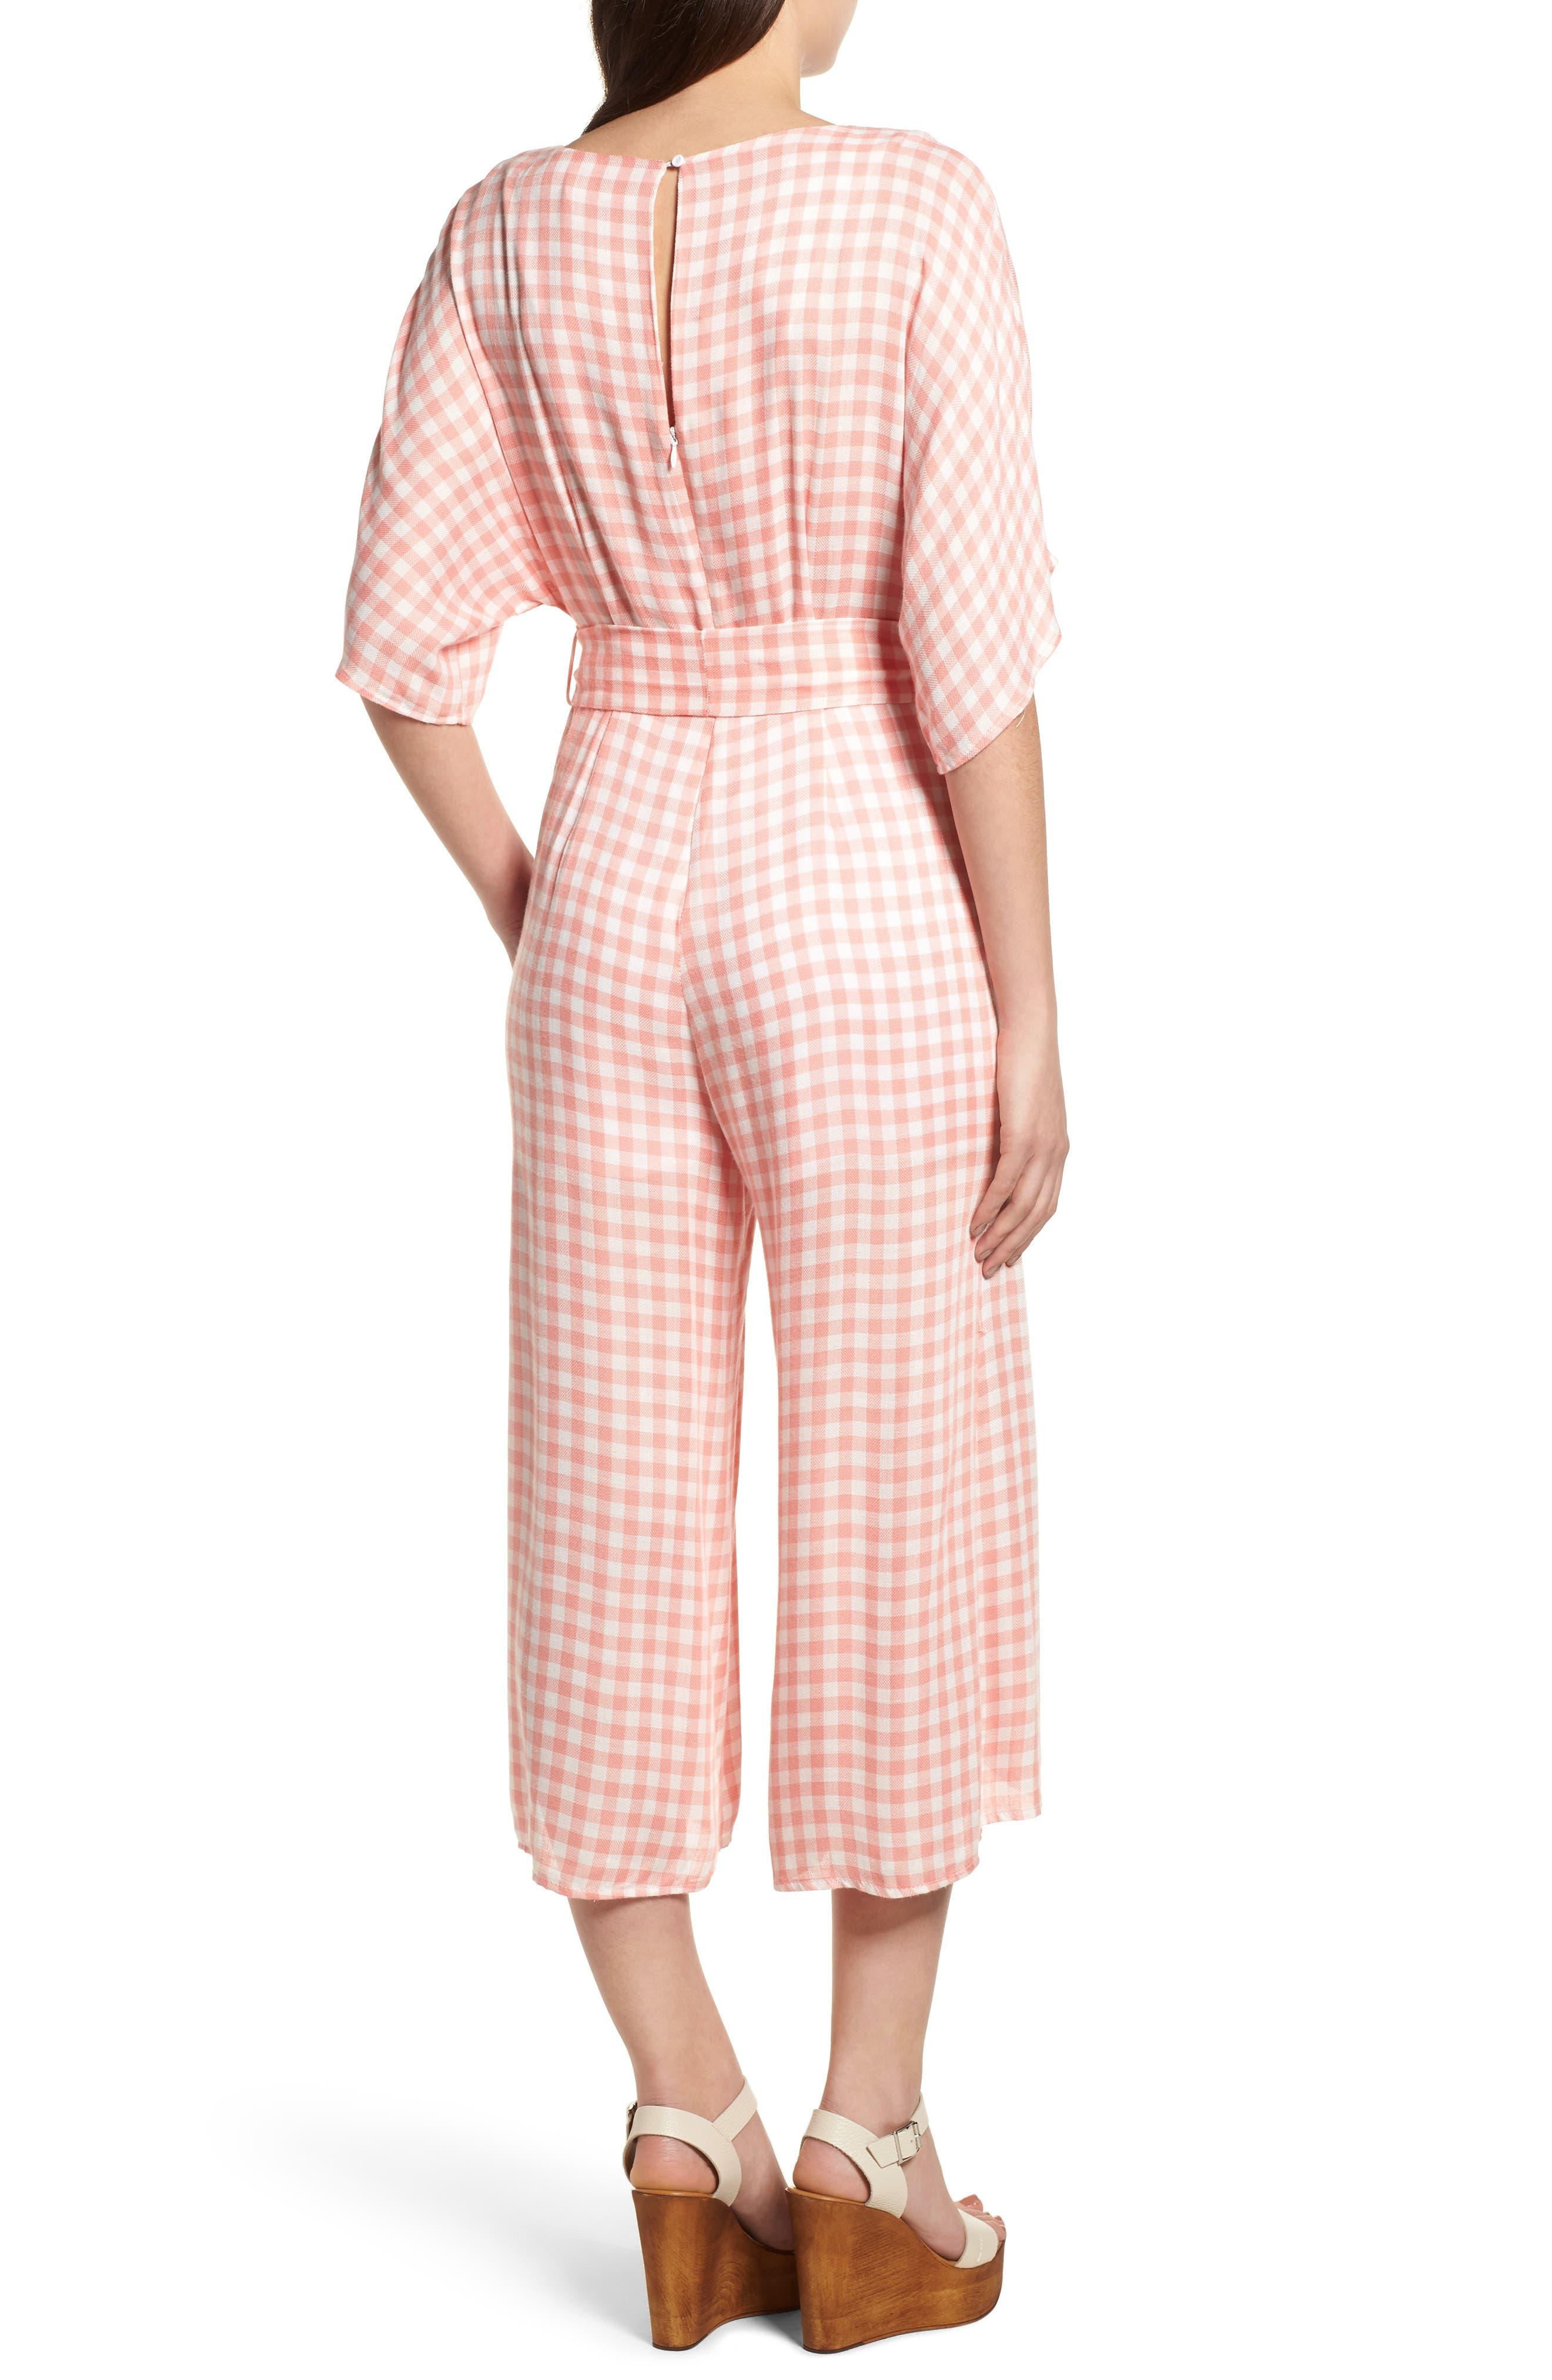 Brunch Gingham Jumpsuit,                             Alternate thumbnail 3, color,                             Grapefruit Pink